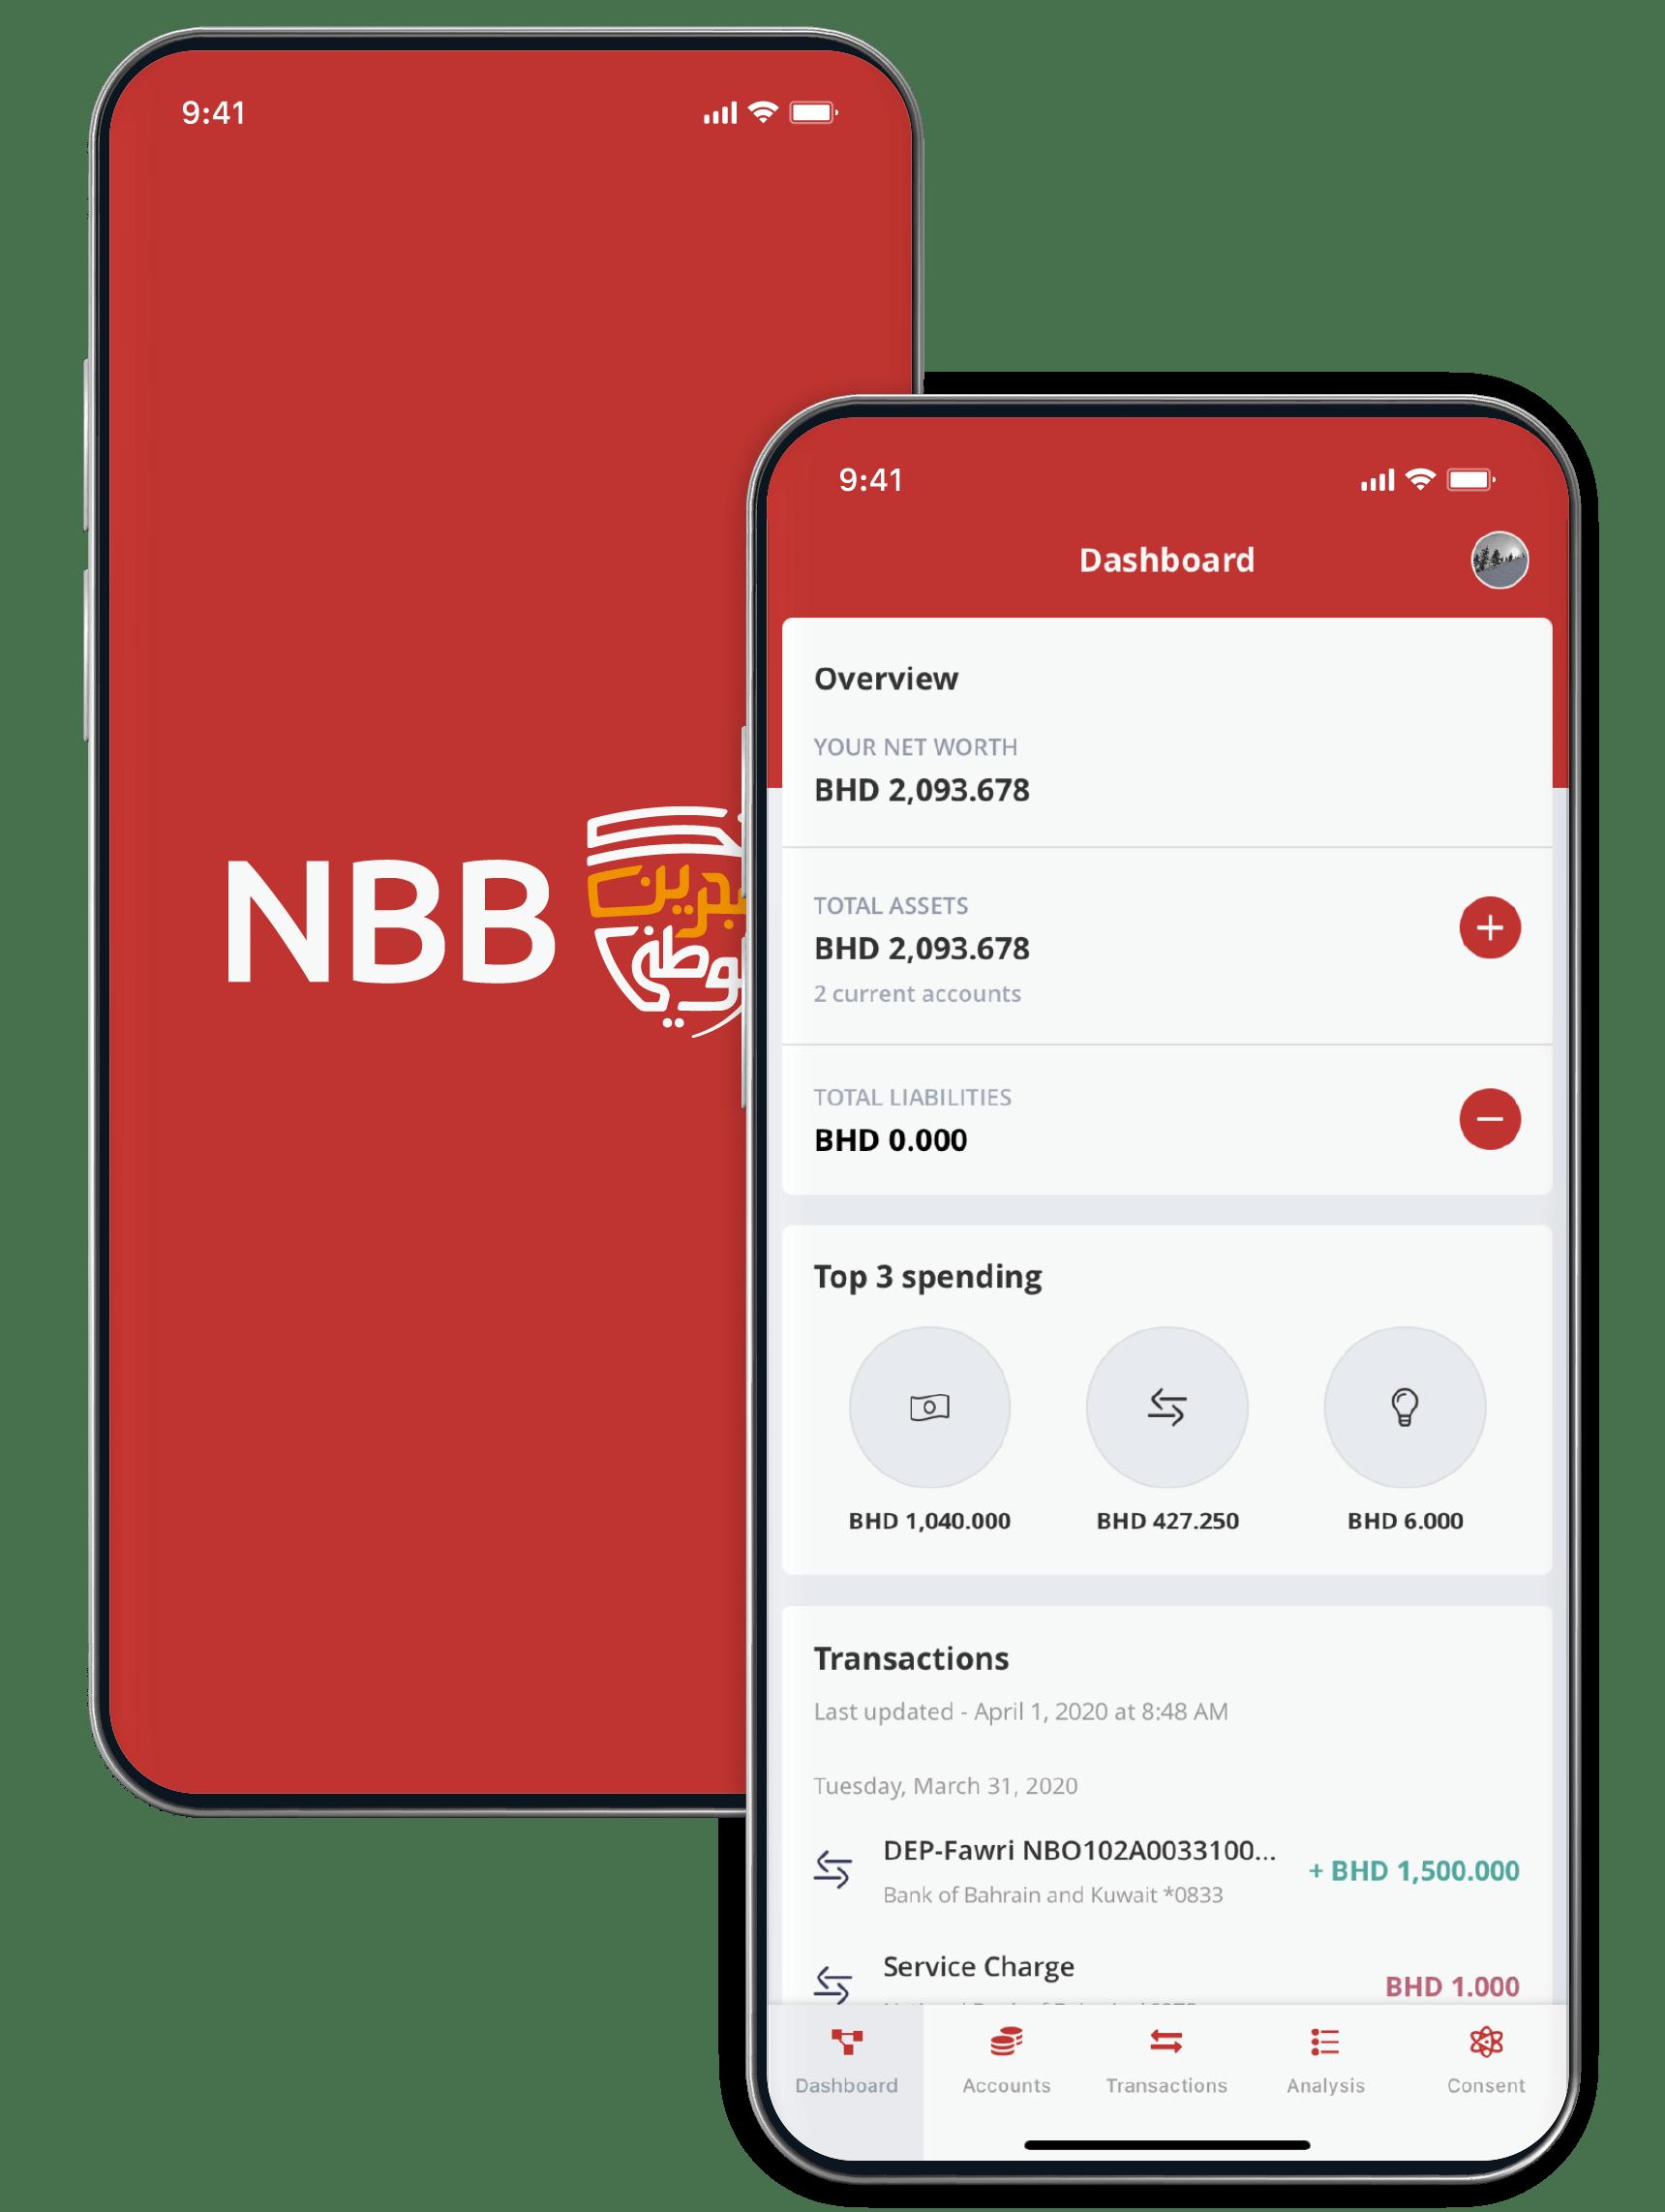 Account Aggregation - National Bank of Bahrain